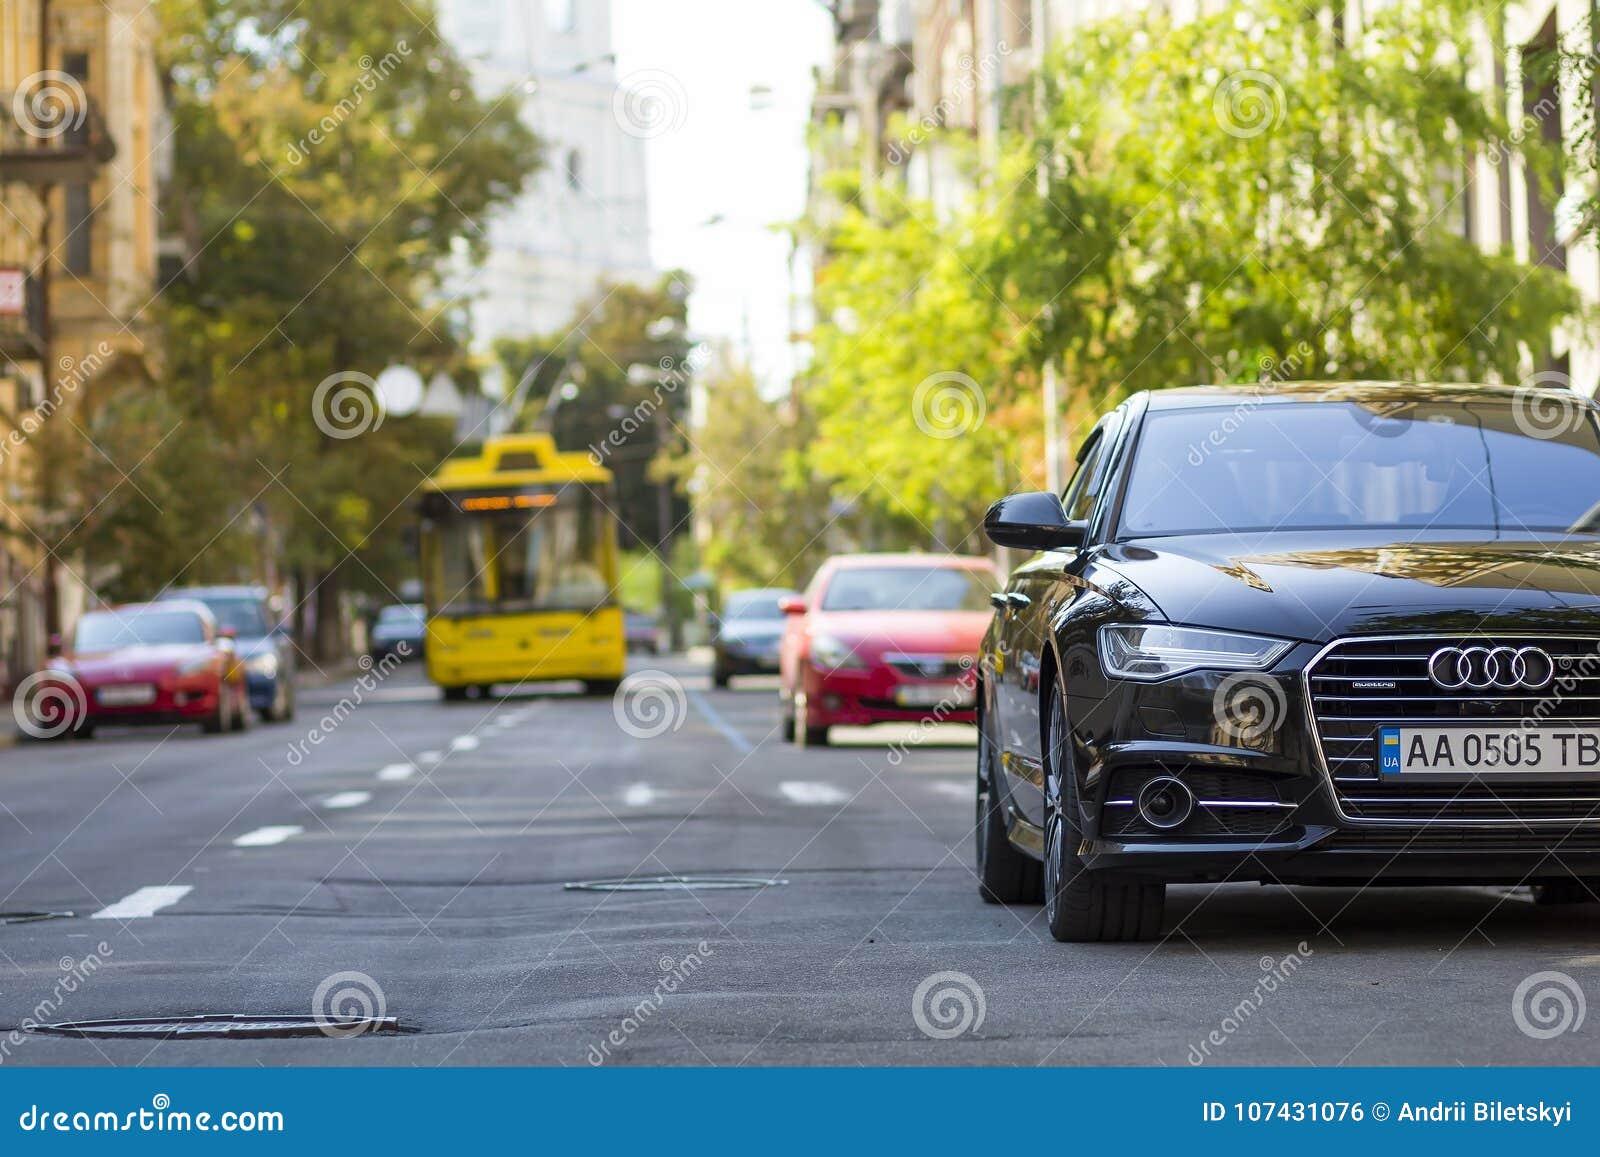 Kyiv, Ουκρανία - 12 Νοεμβρίου 2017: Σύγχρονο νέο αυτοκίνητο στην πλευρά